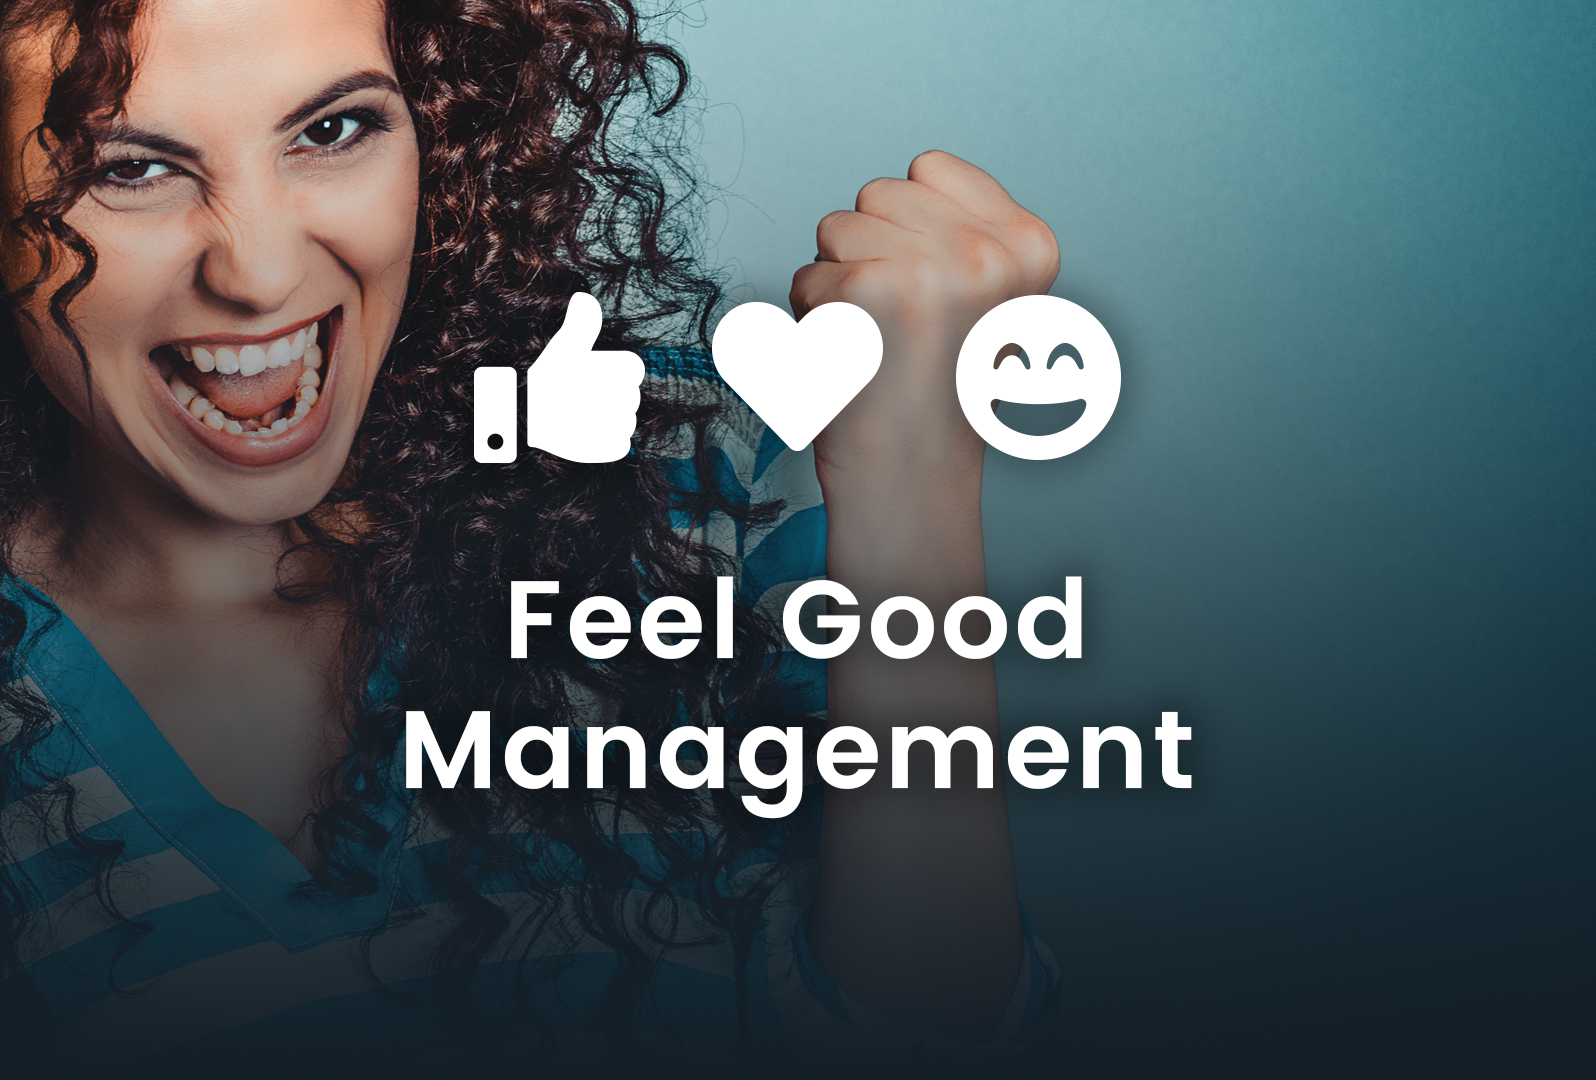 Feel Good Management